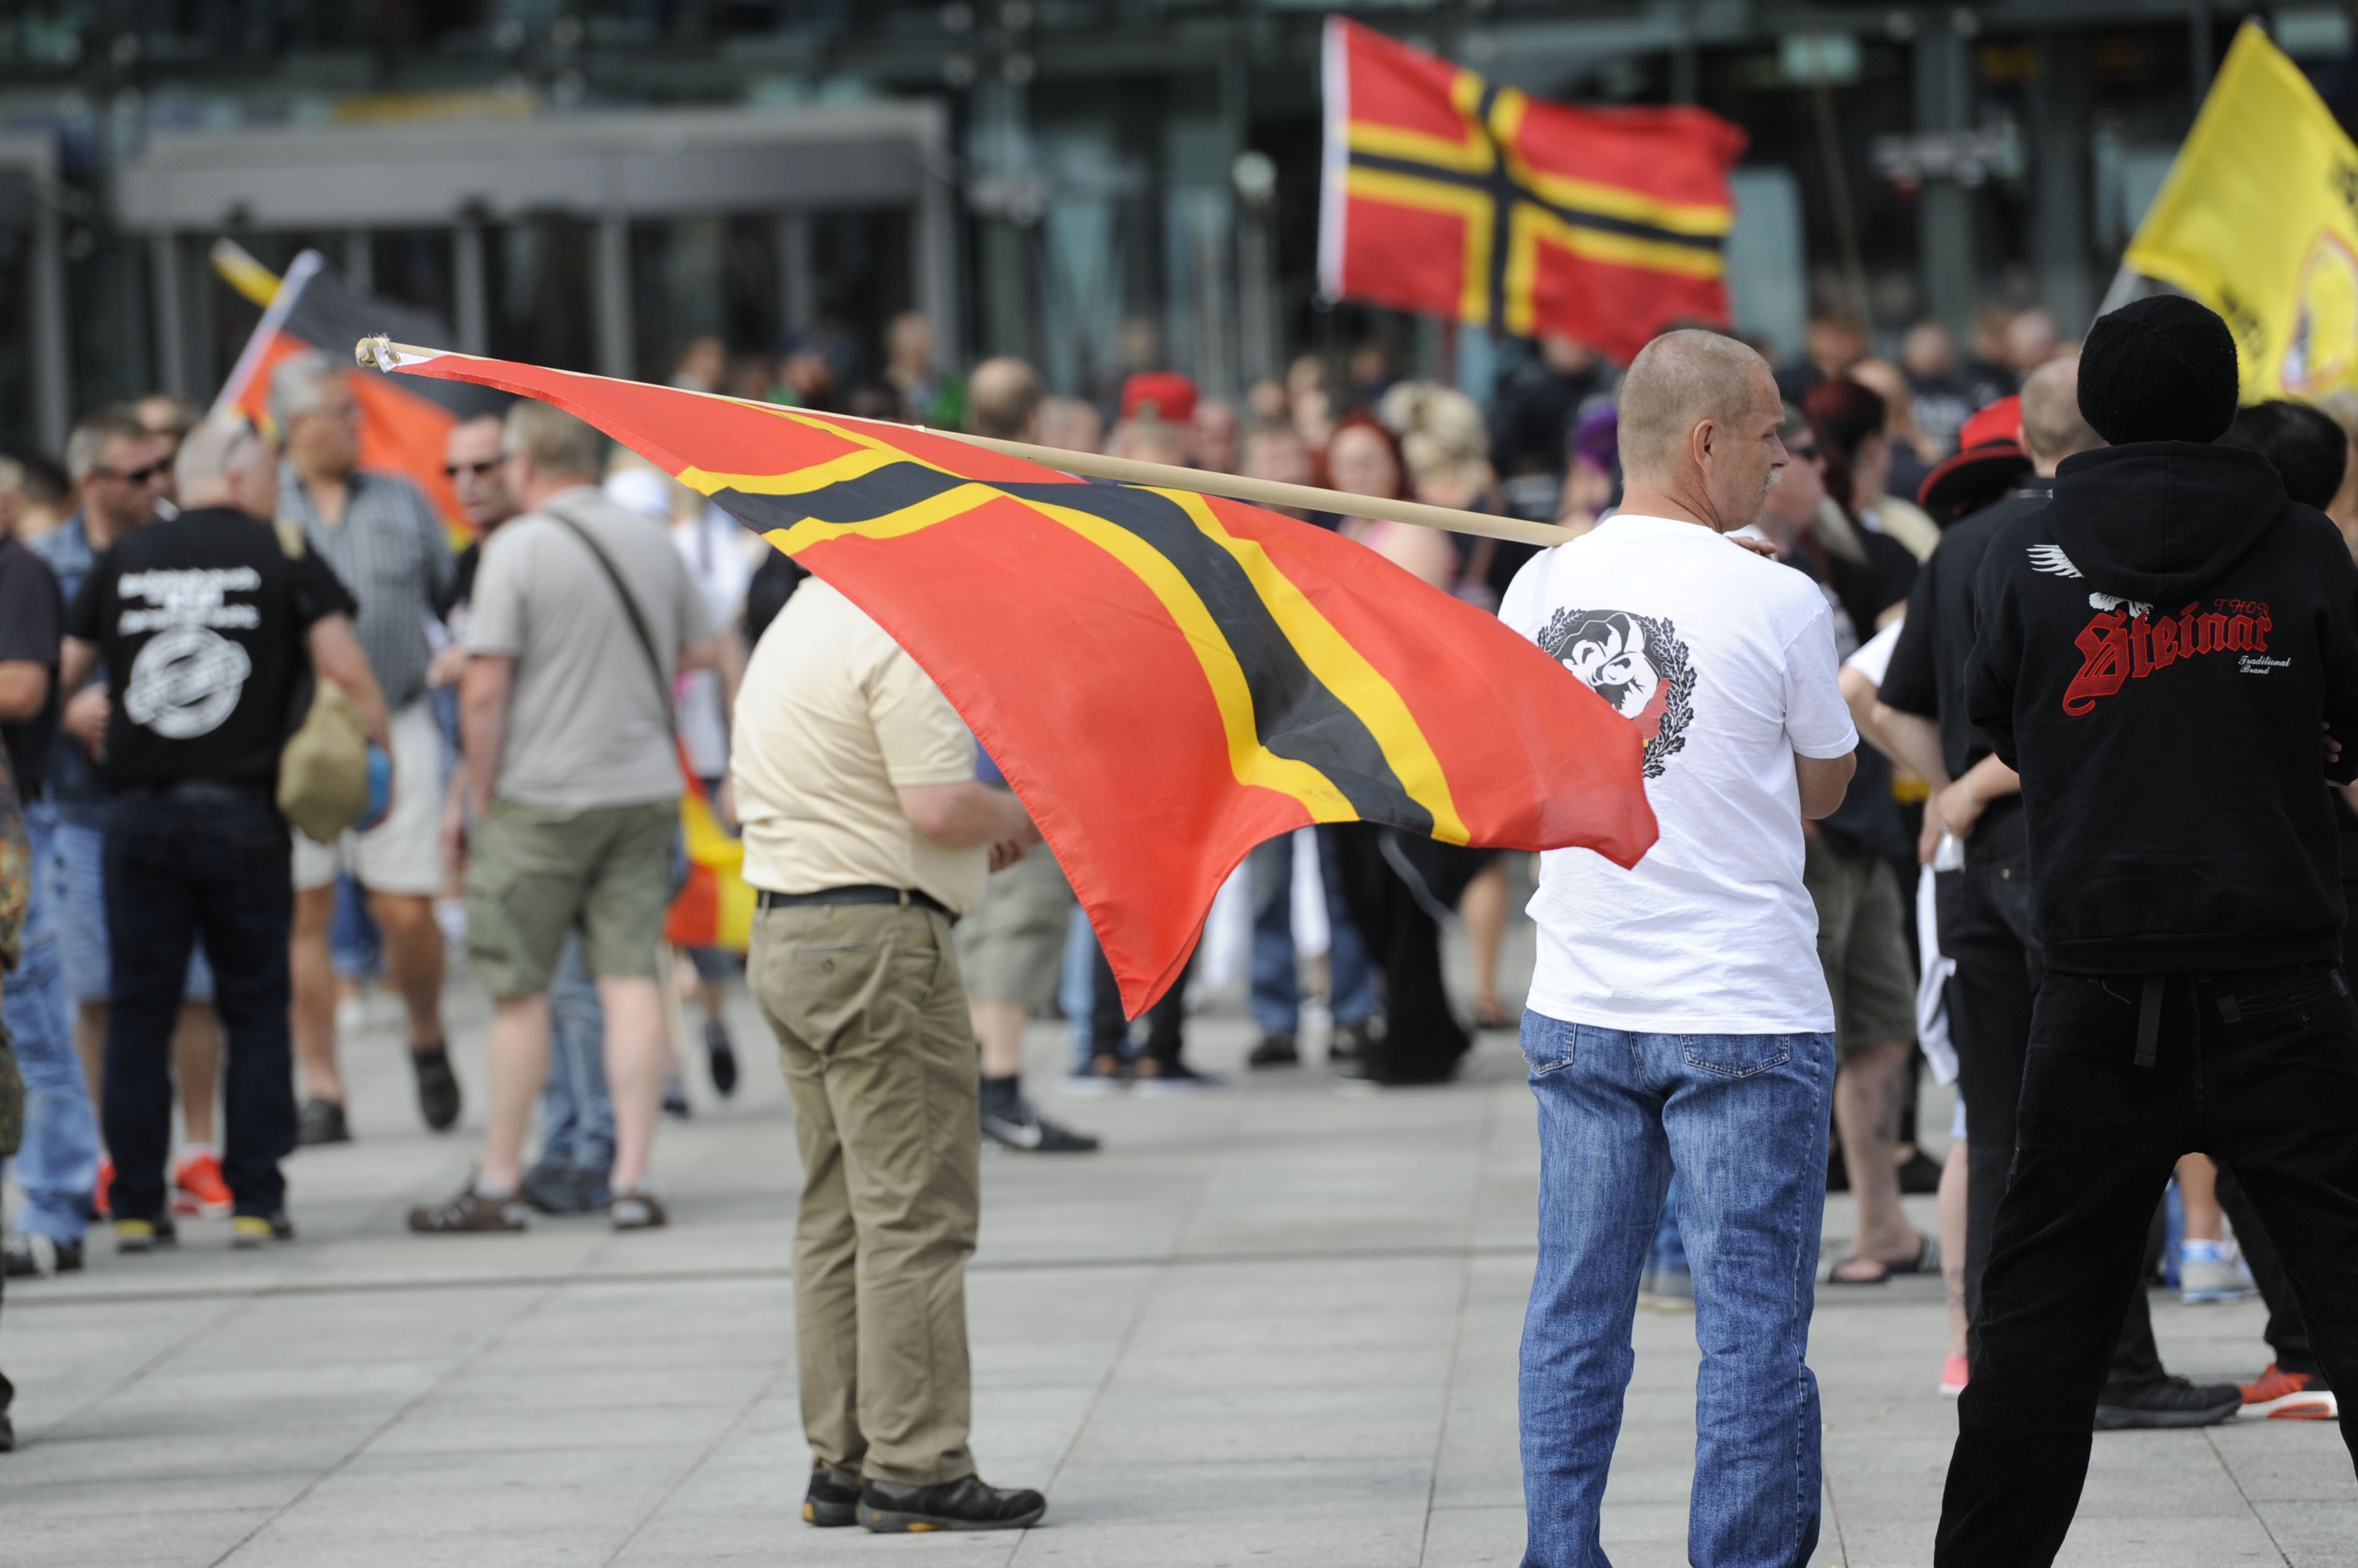 Berlino, la destra in piazza contro Angela Merkel (LaPresse)